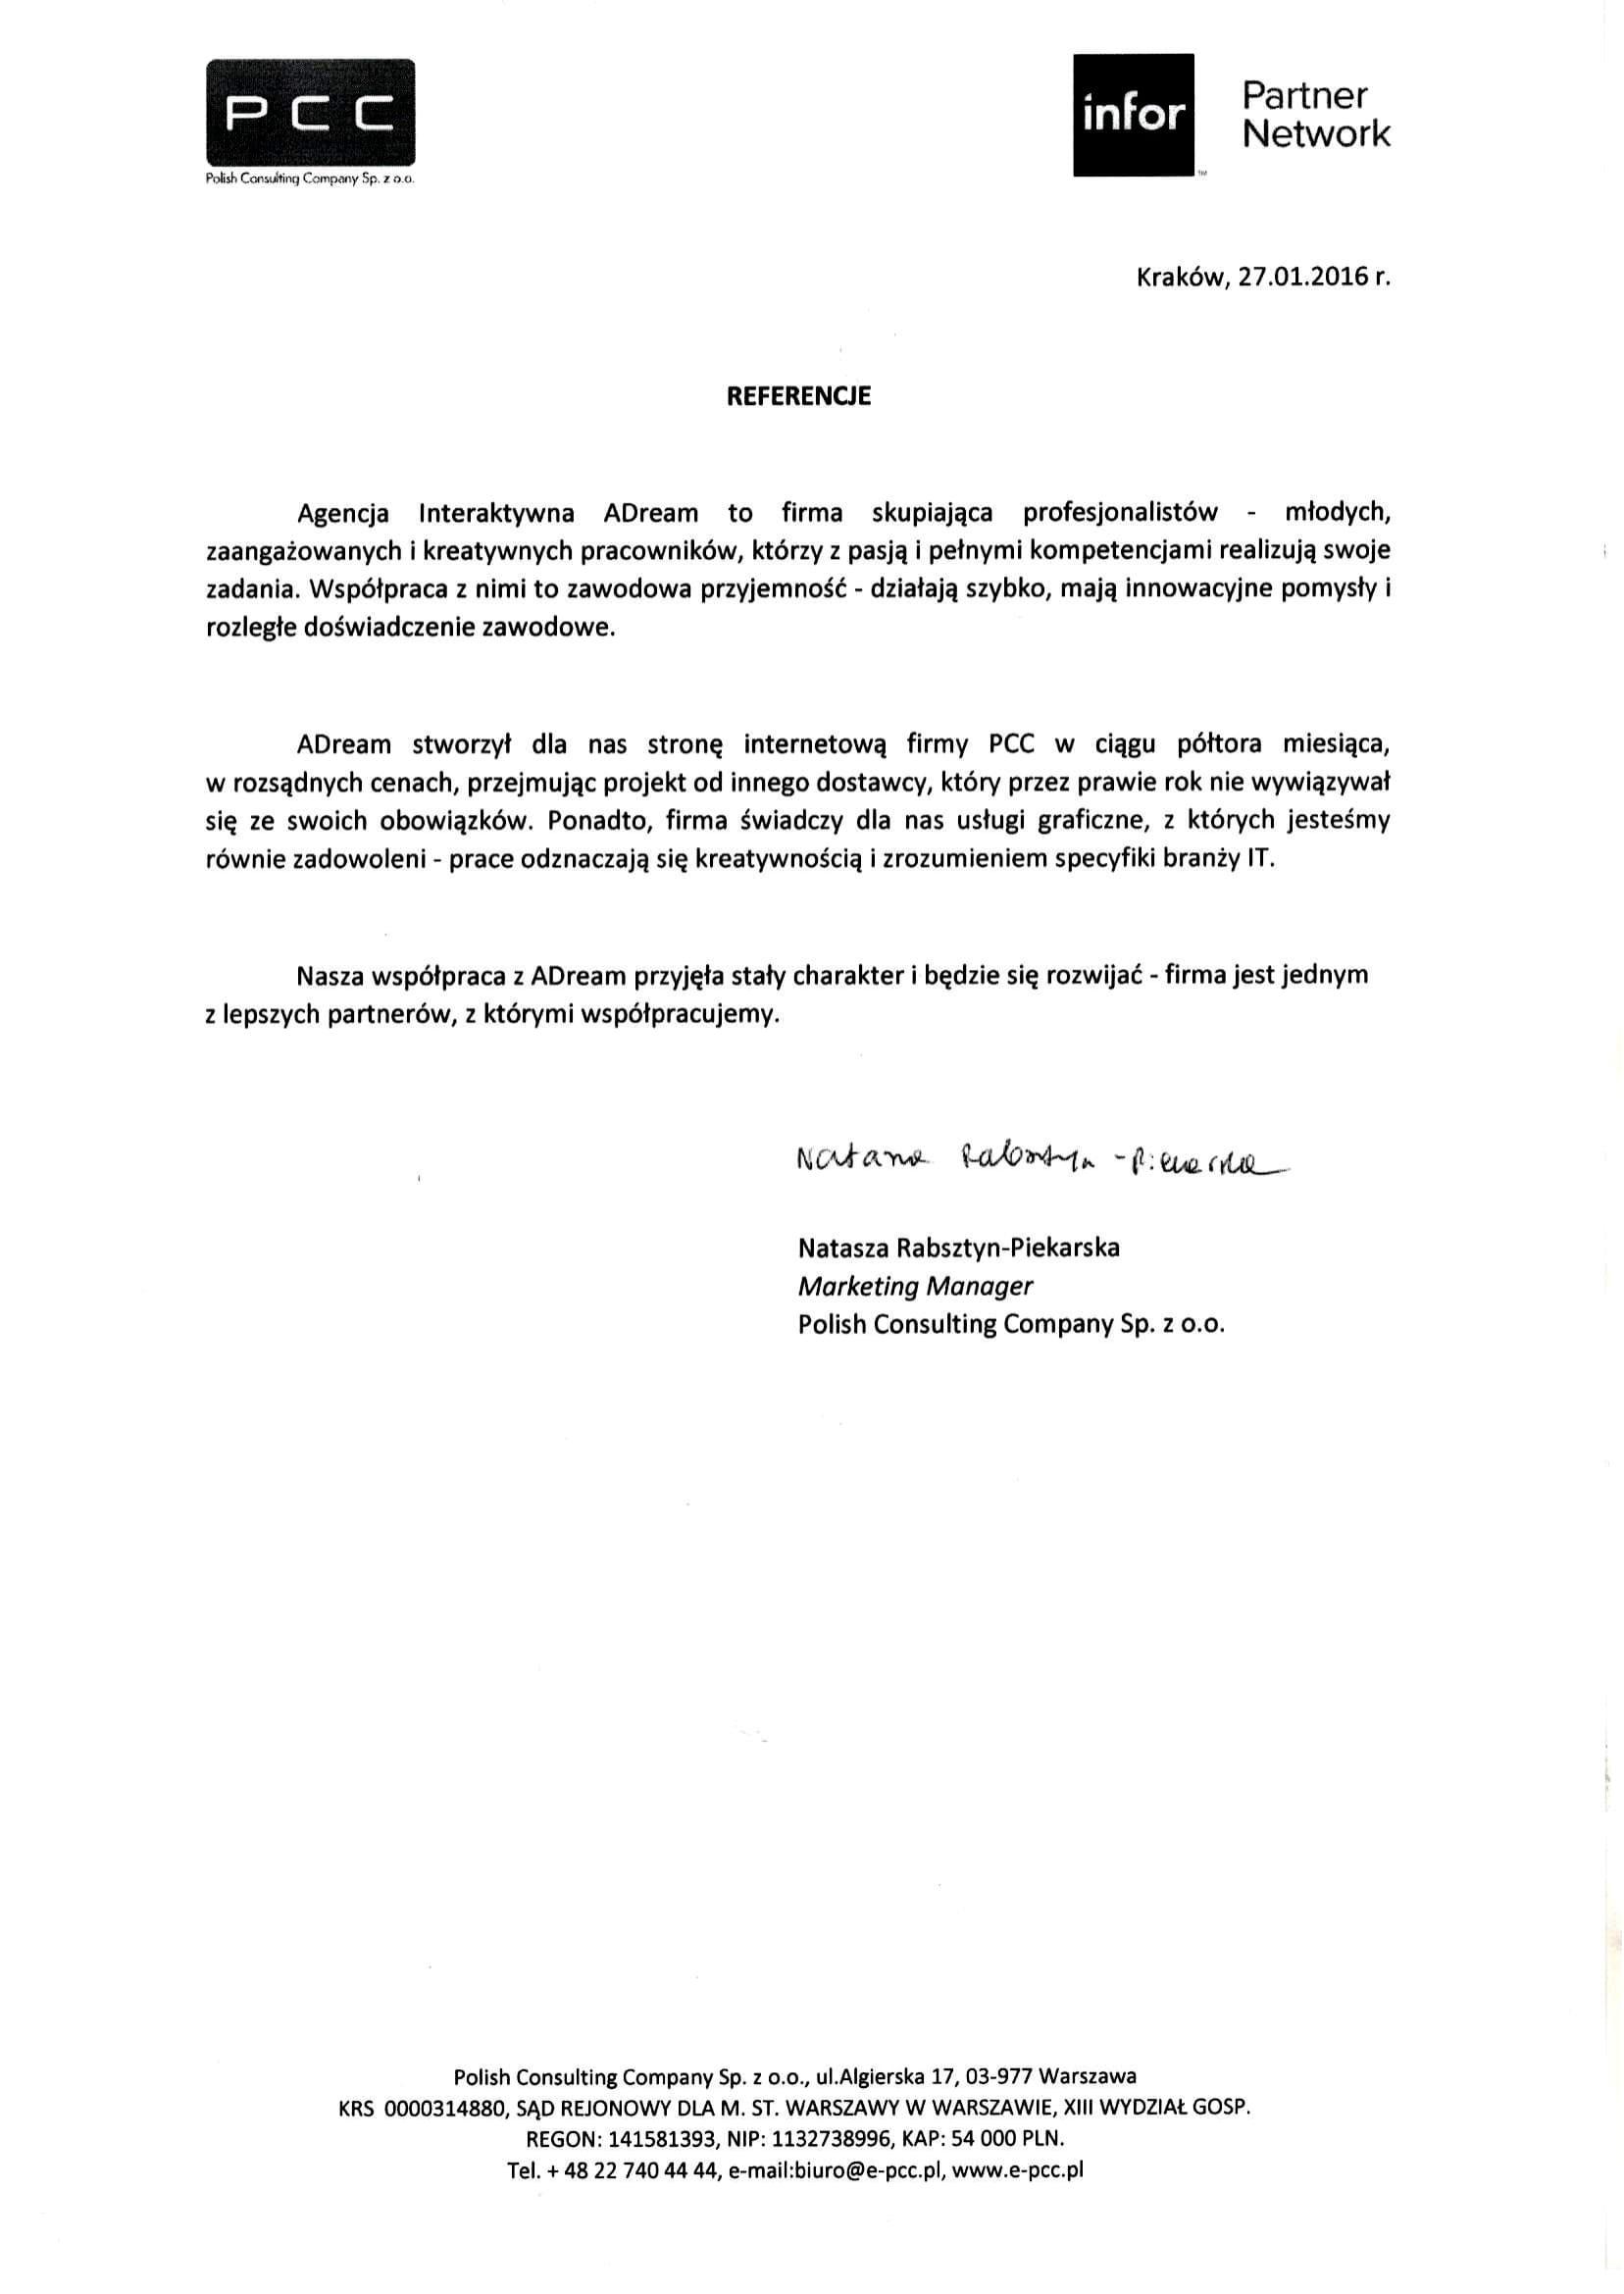 iPCC (dawniej Polish Consulting Company)